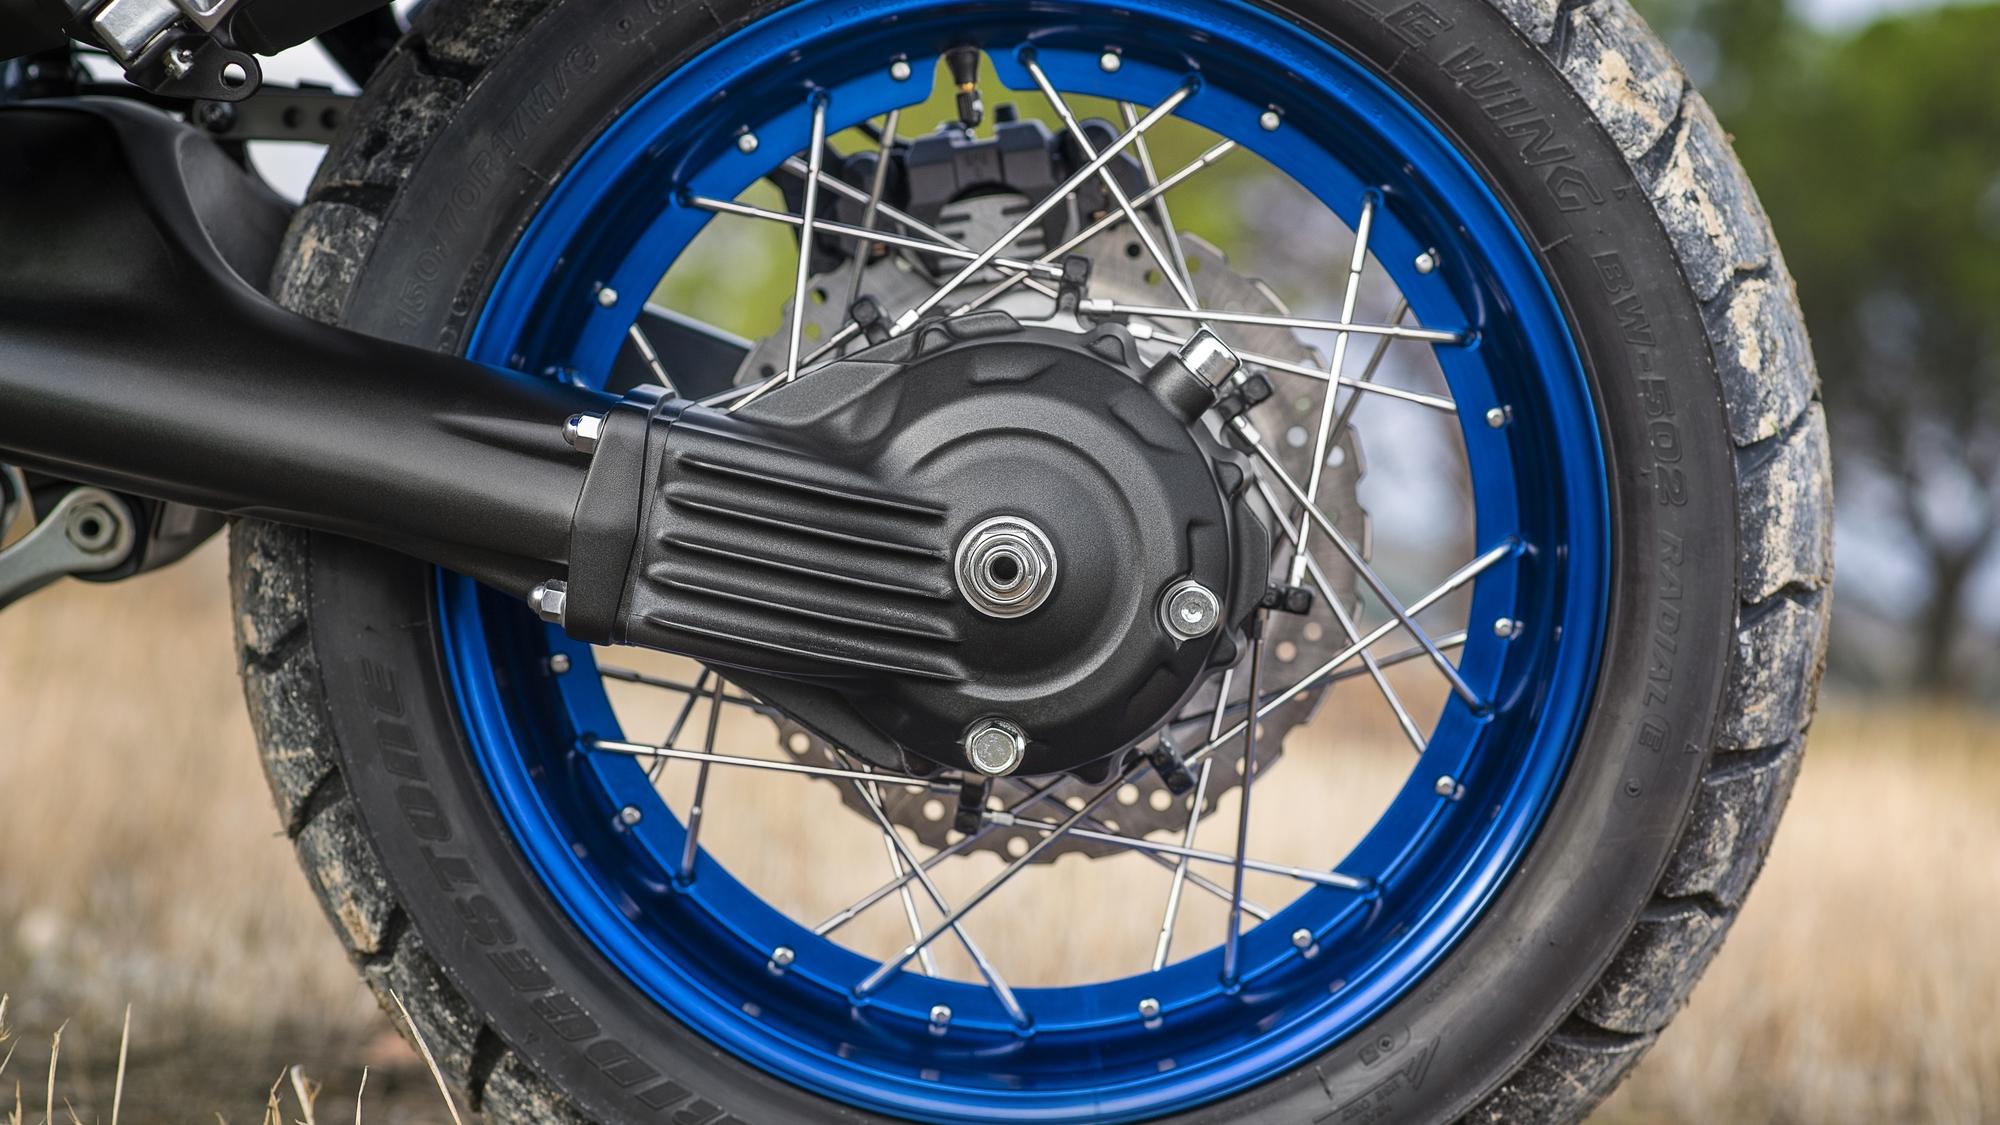 Yamaha XT1200Z Super Ténéré - Features and Technical